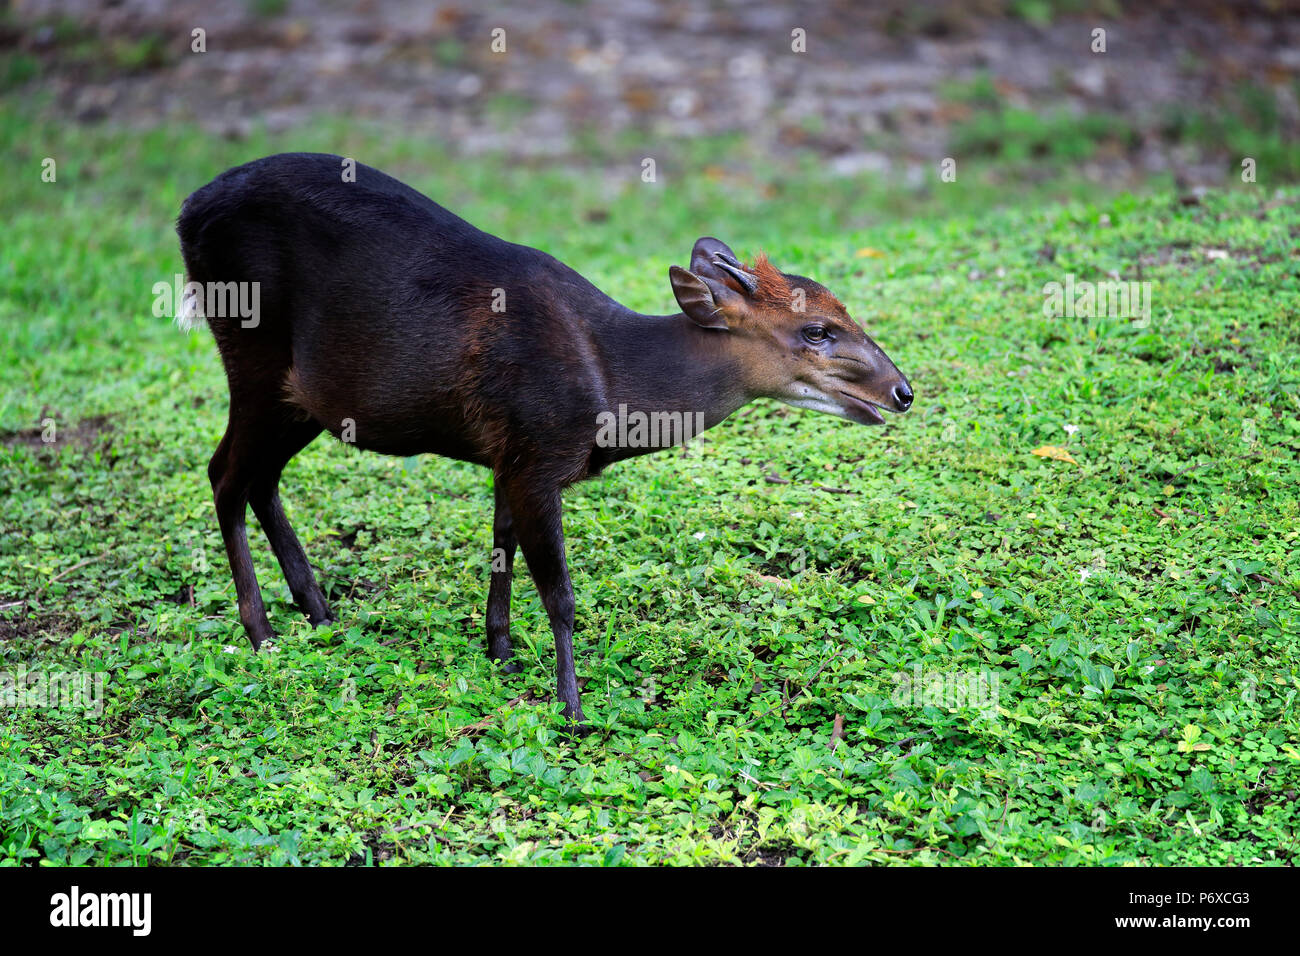 Black Duiker, adult male, Africa, Cephalophus niger - Stock Image